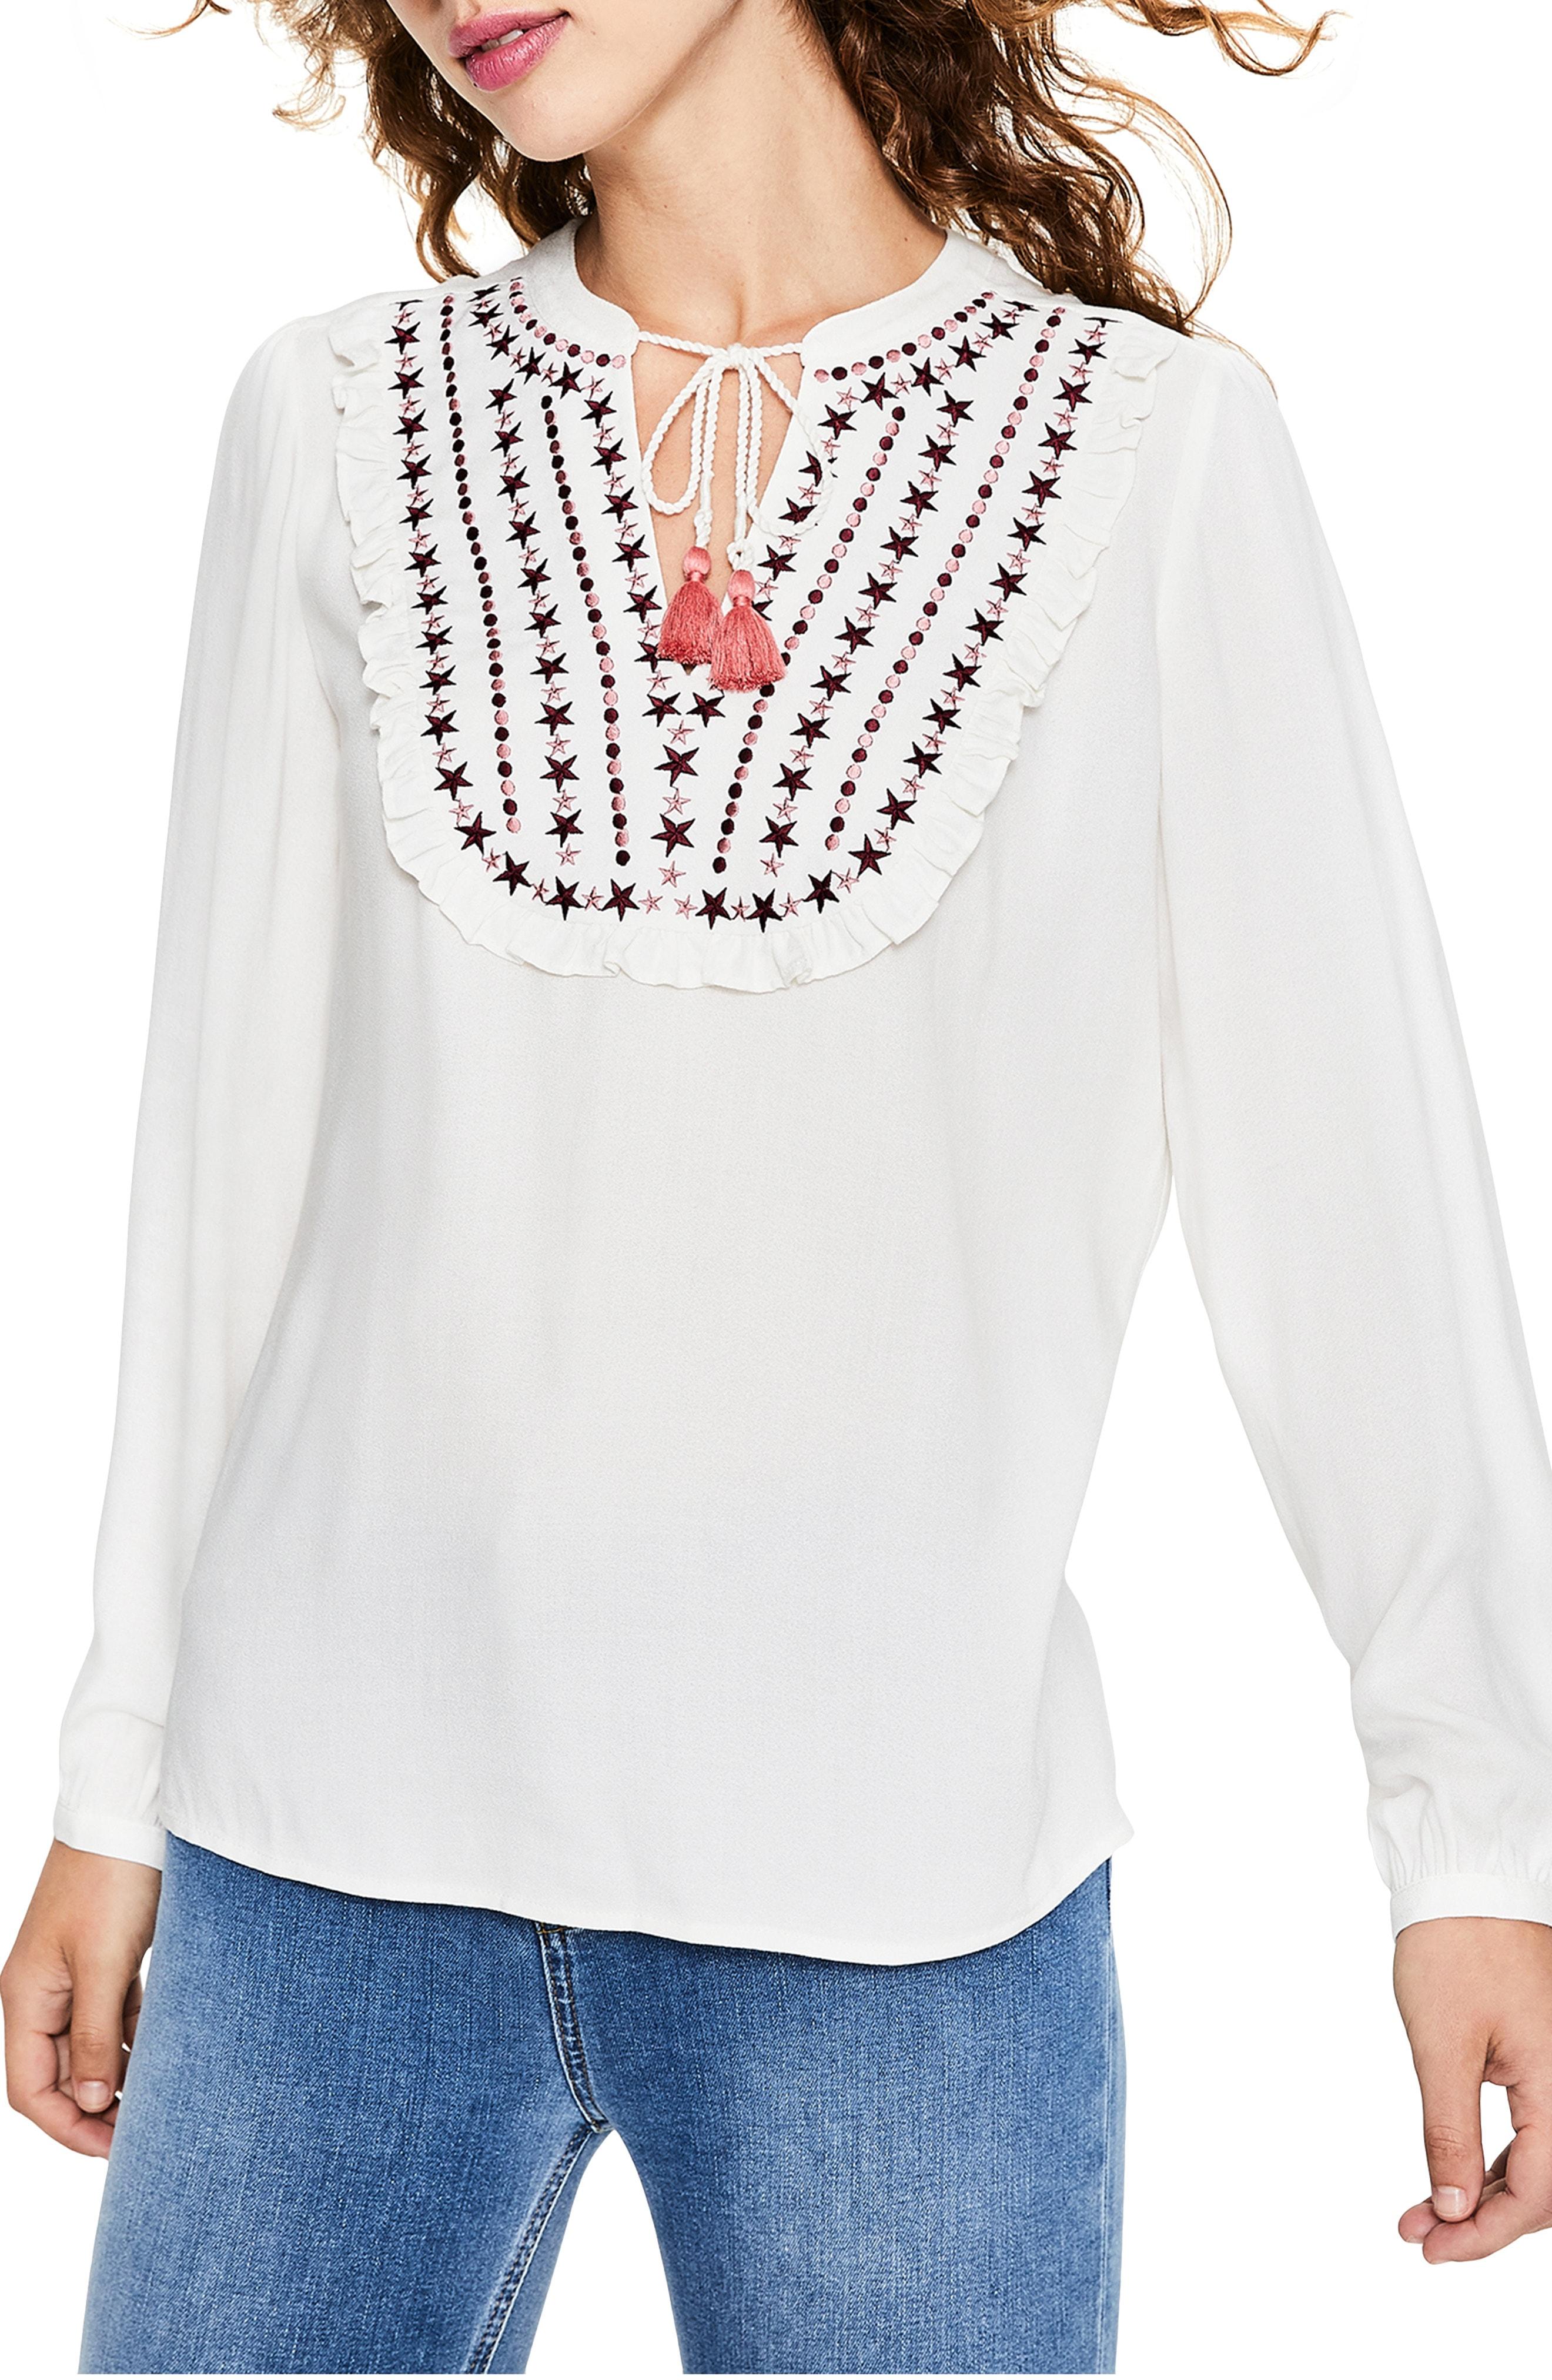 Boden Star Embroidery Tassel Tie Top